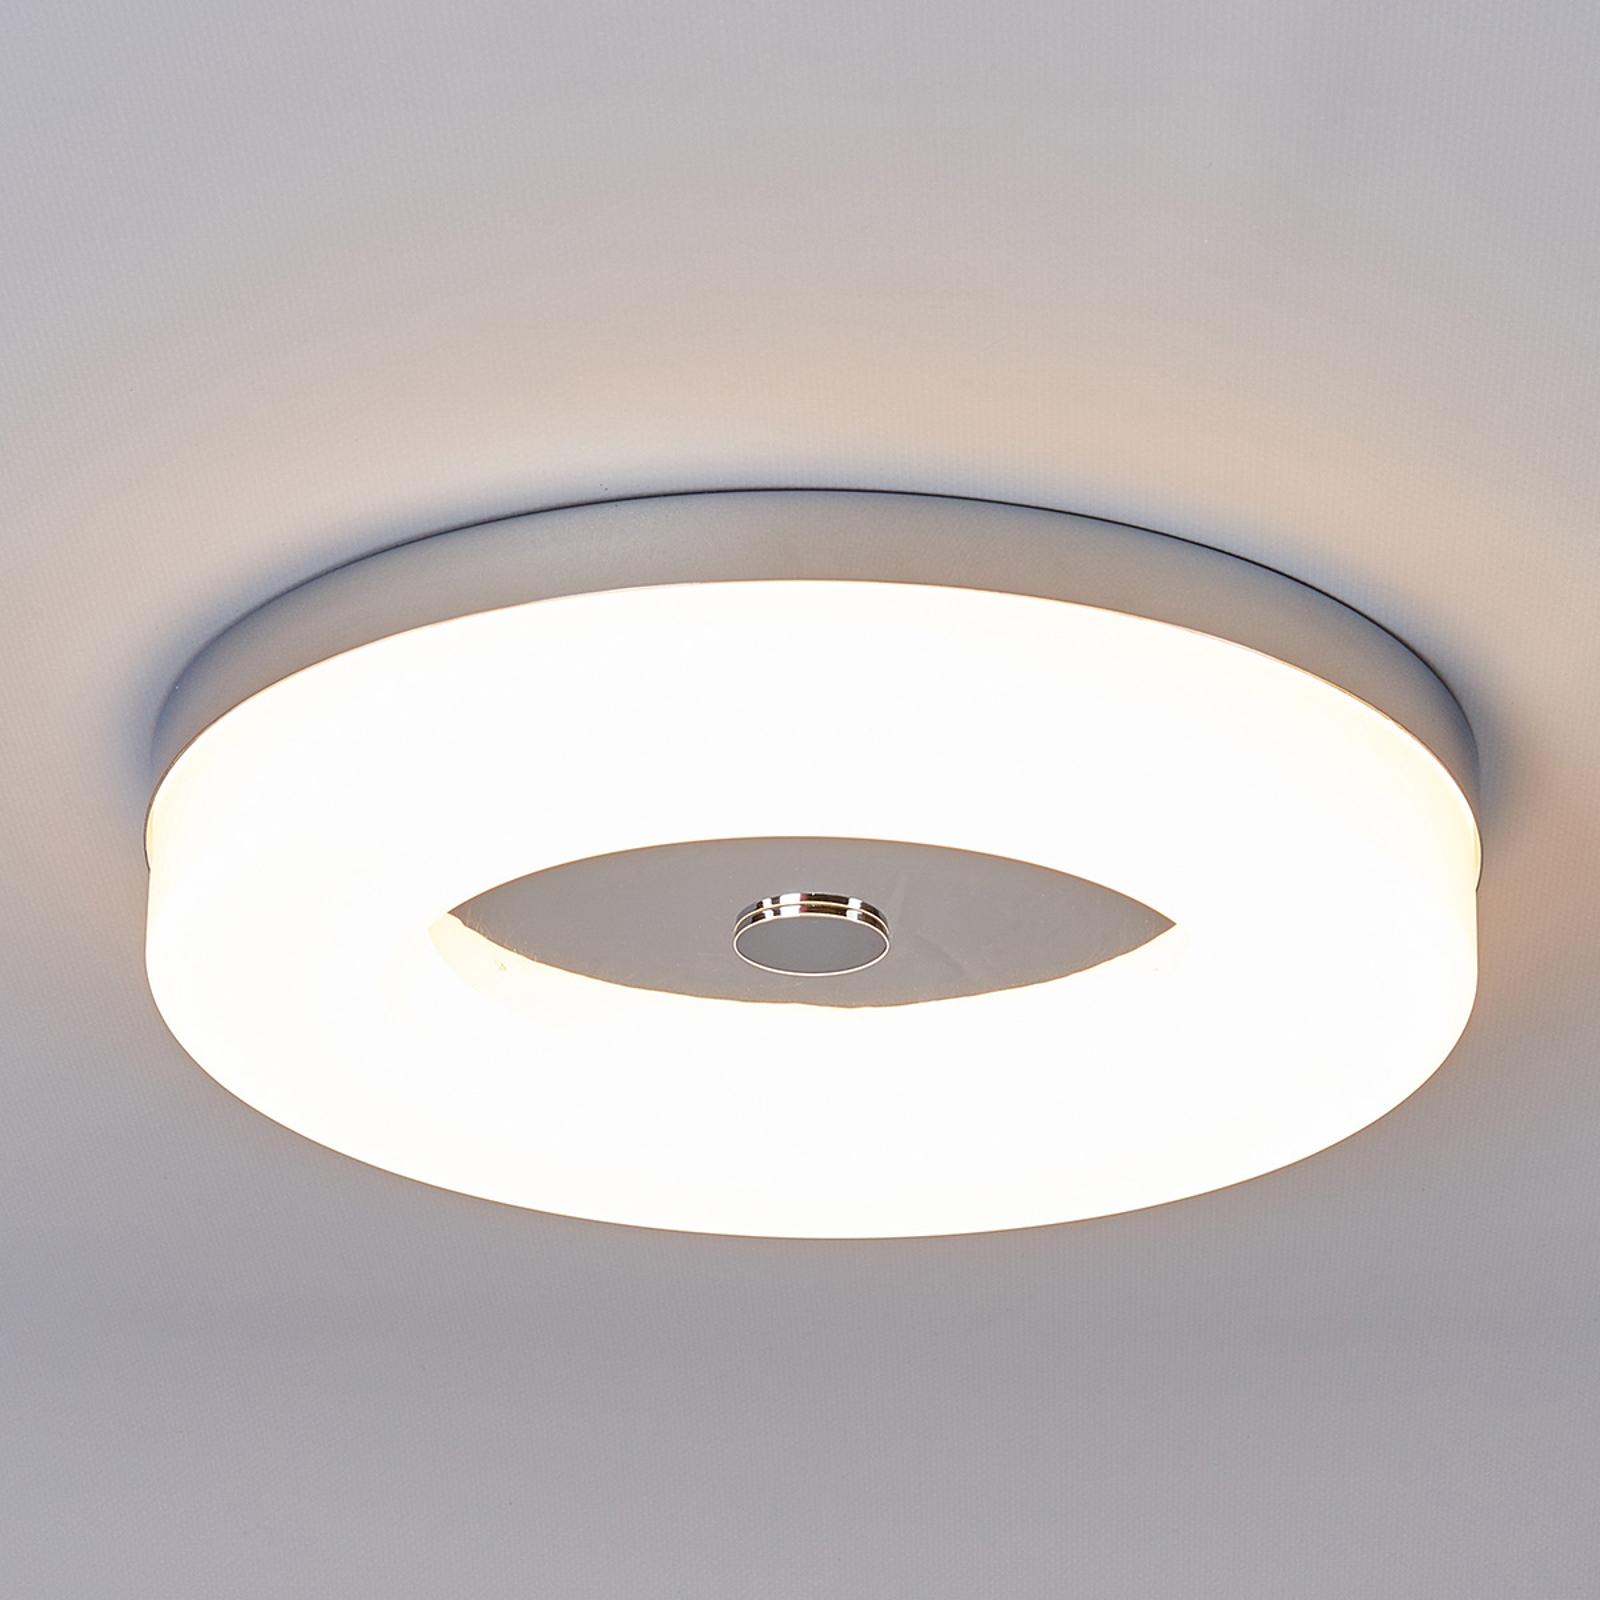 Lampa sufitowa LED SHANIA w kszt. pierścienia